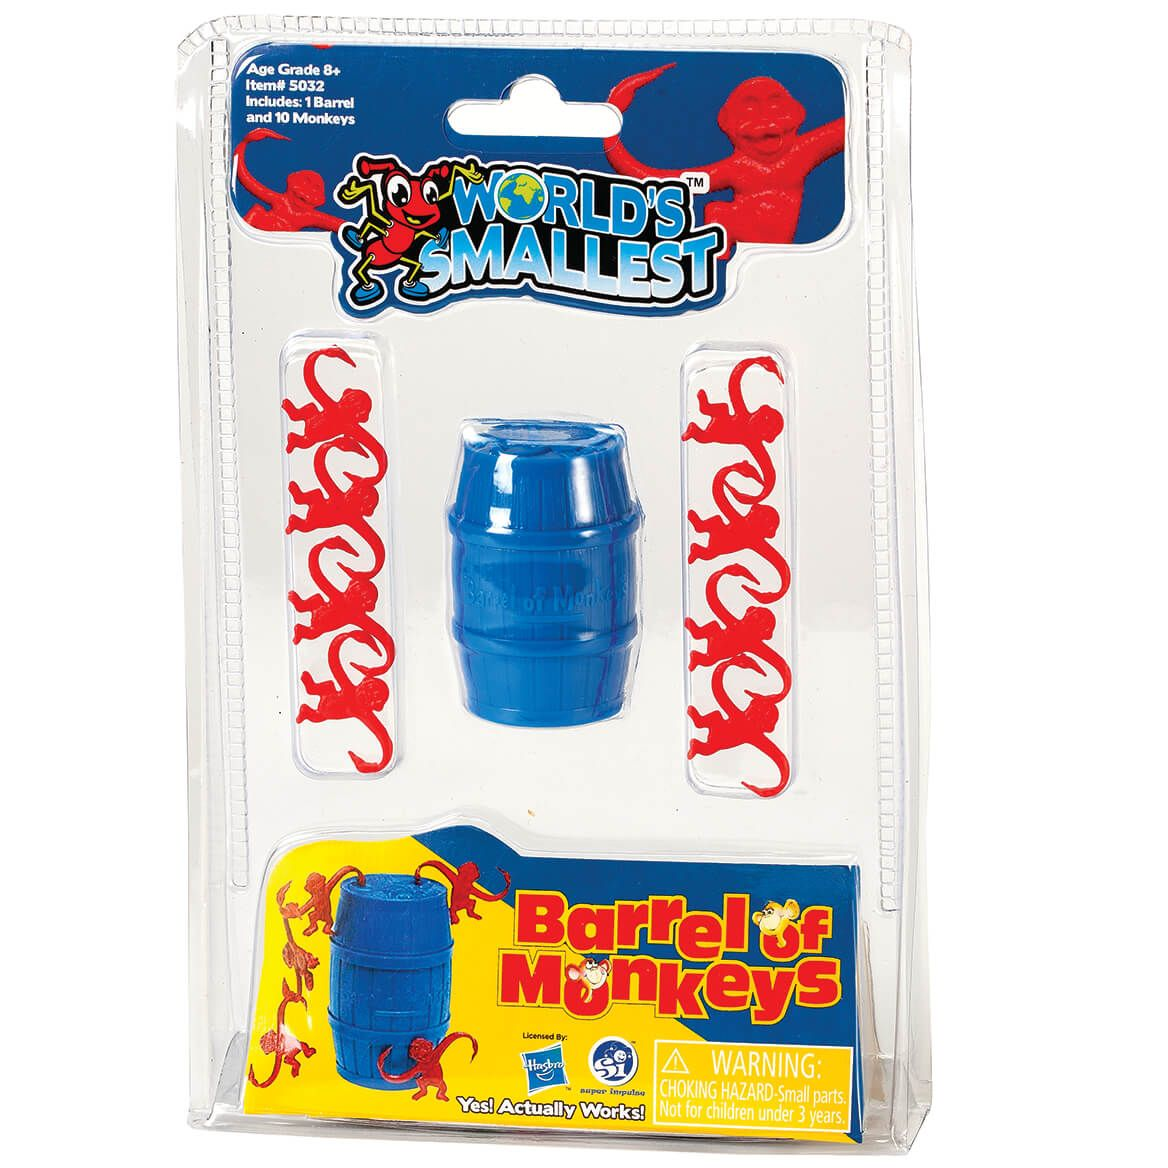 World's Smallest™ Barrel of Monkeys-370653